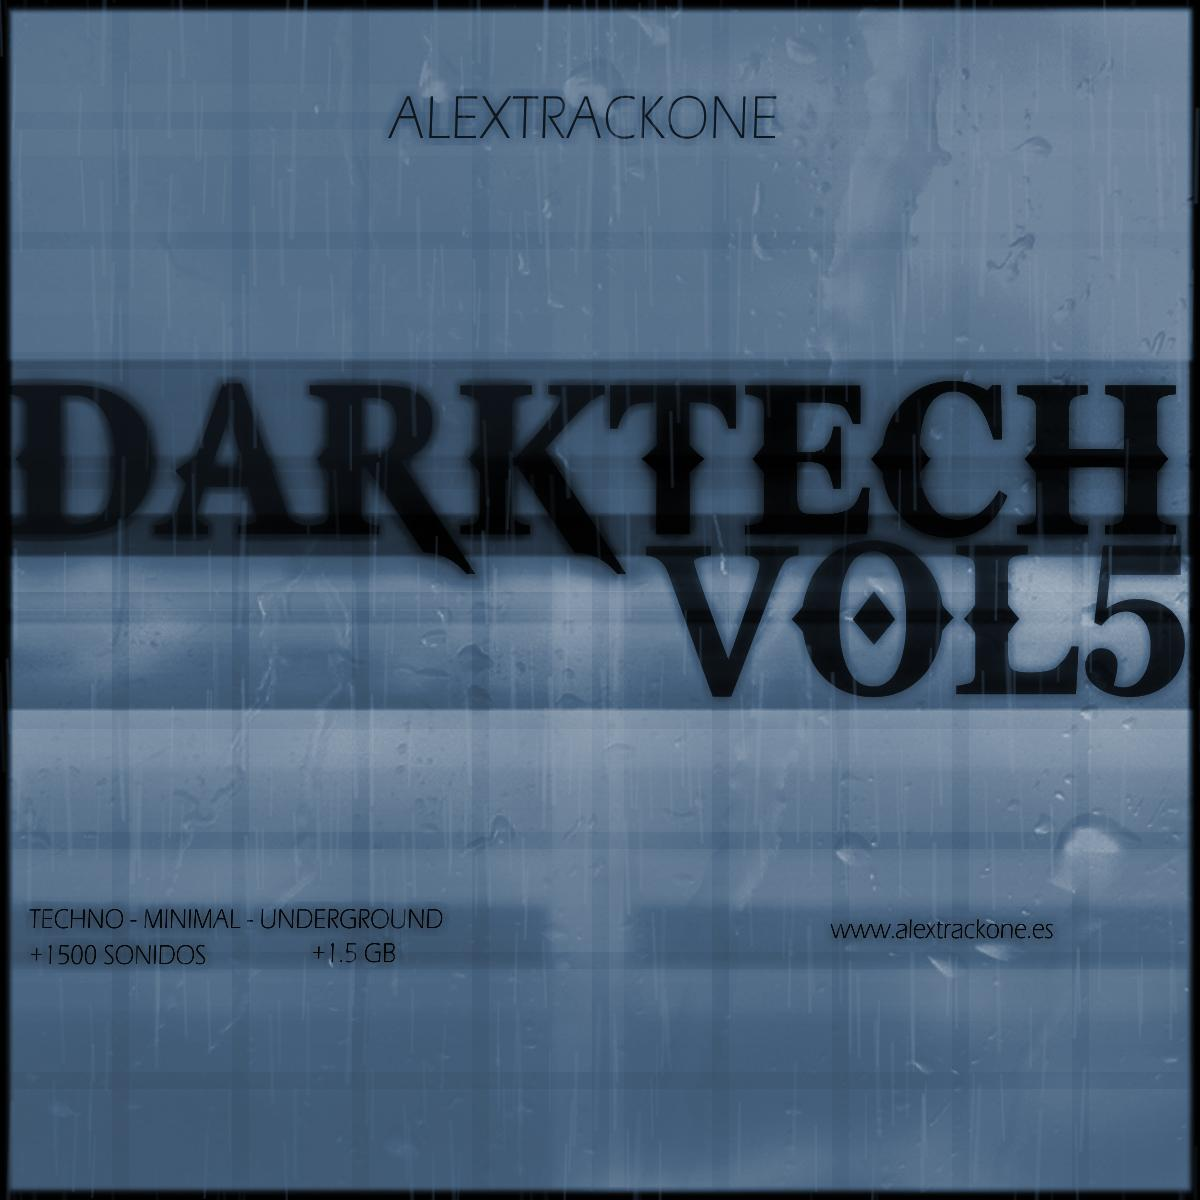 DarkTech Vol 5 - Samples WAV-